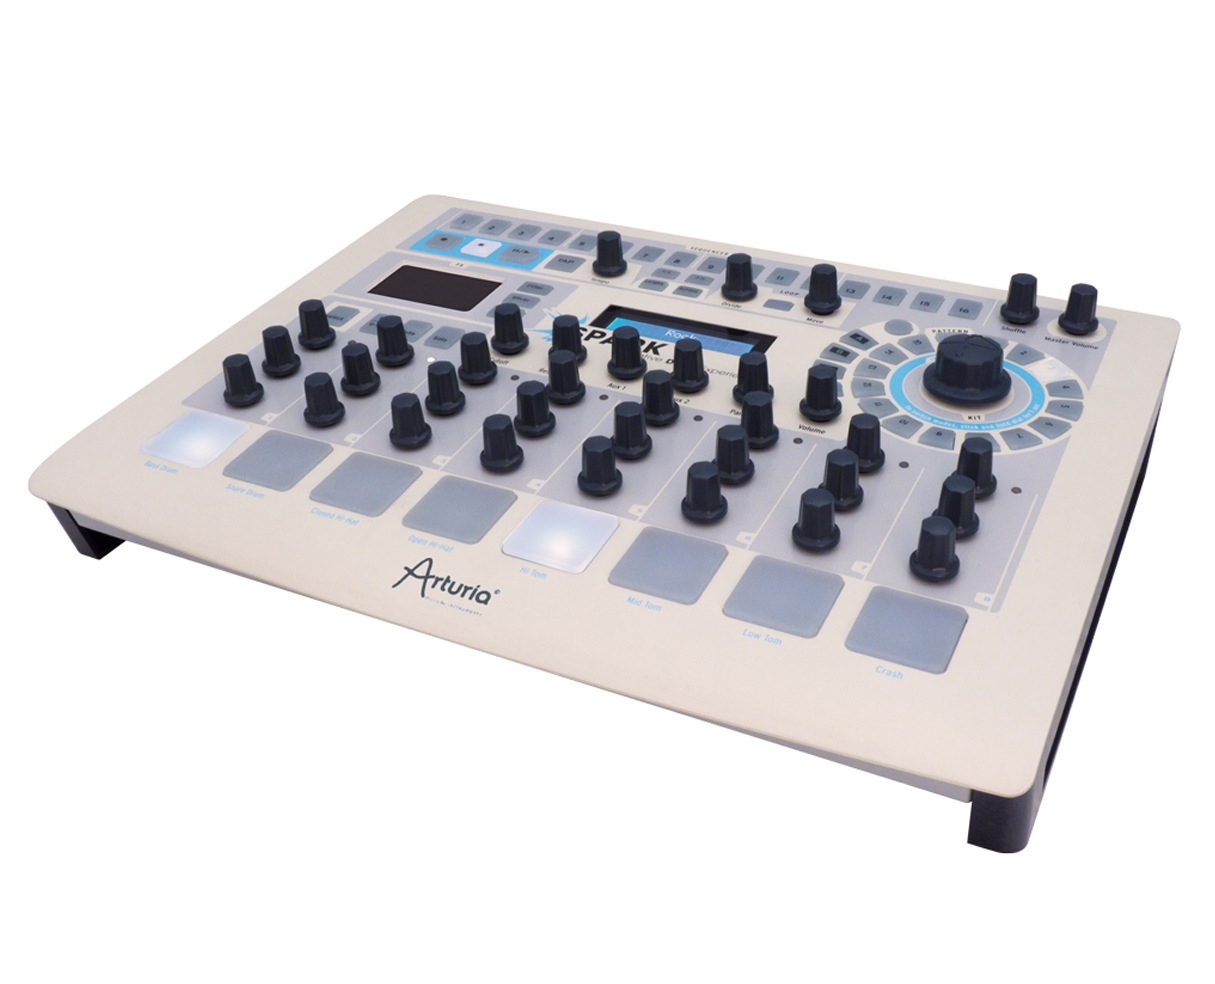 arturia spark analog drum machine proaudiostar ebay. Black Bedroom Furniture Sets. Home Design Ideas